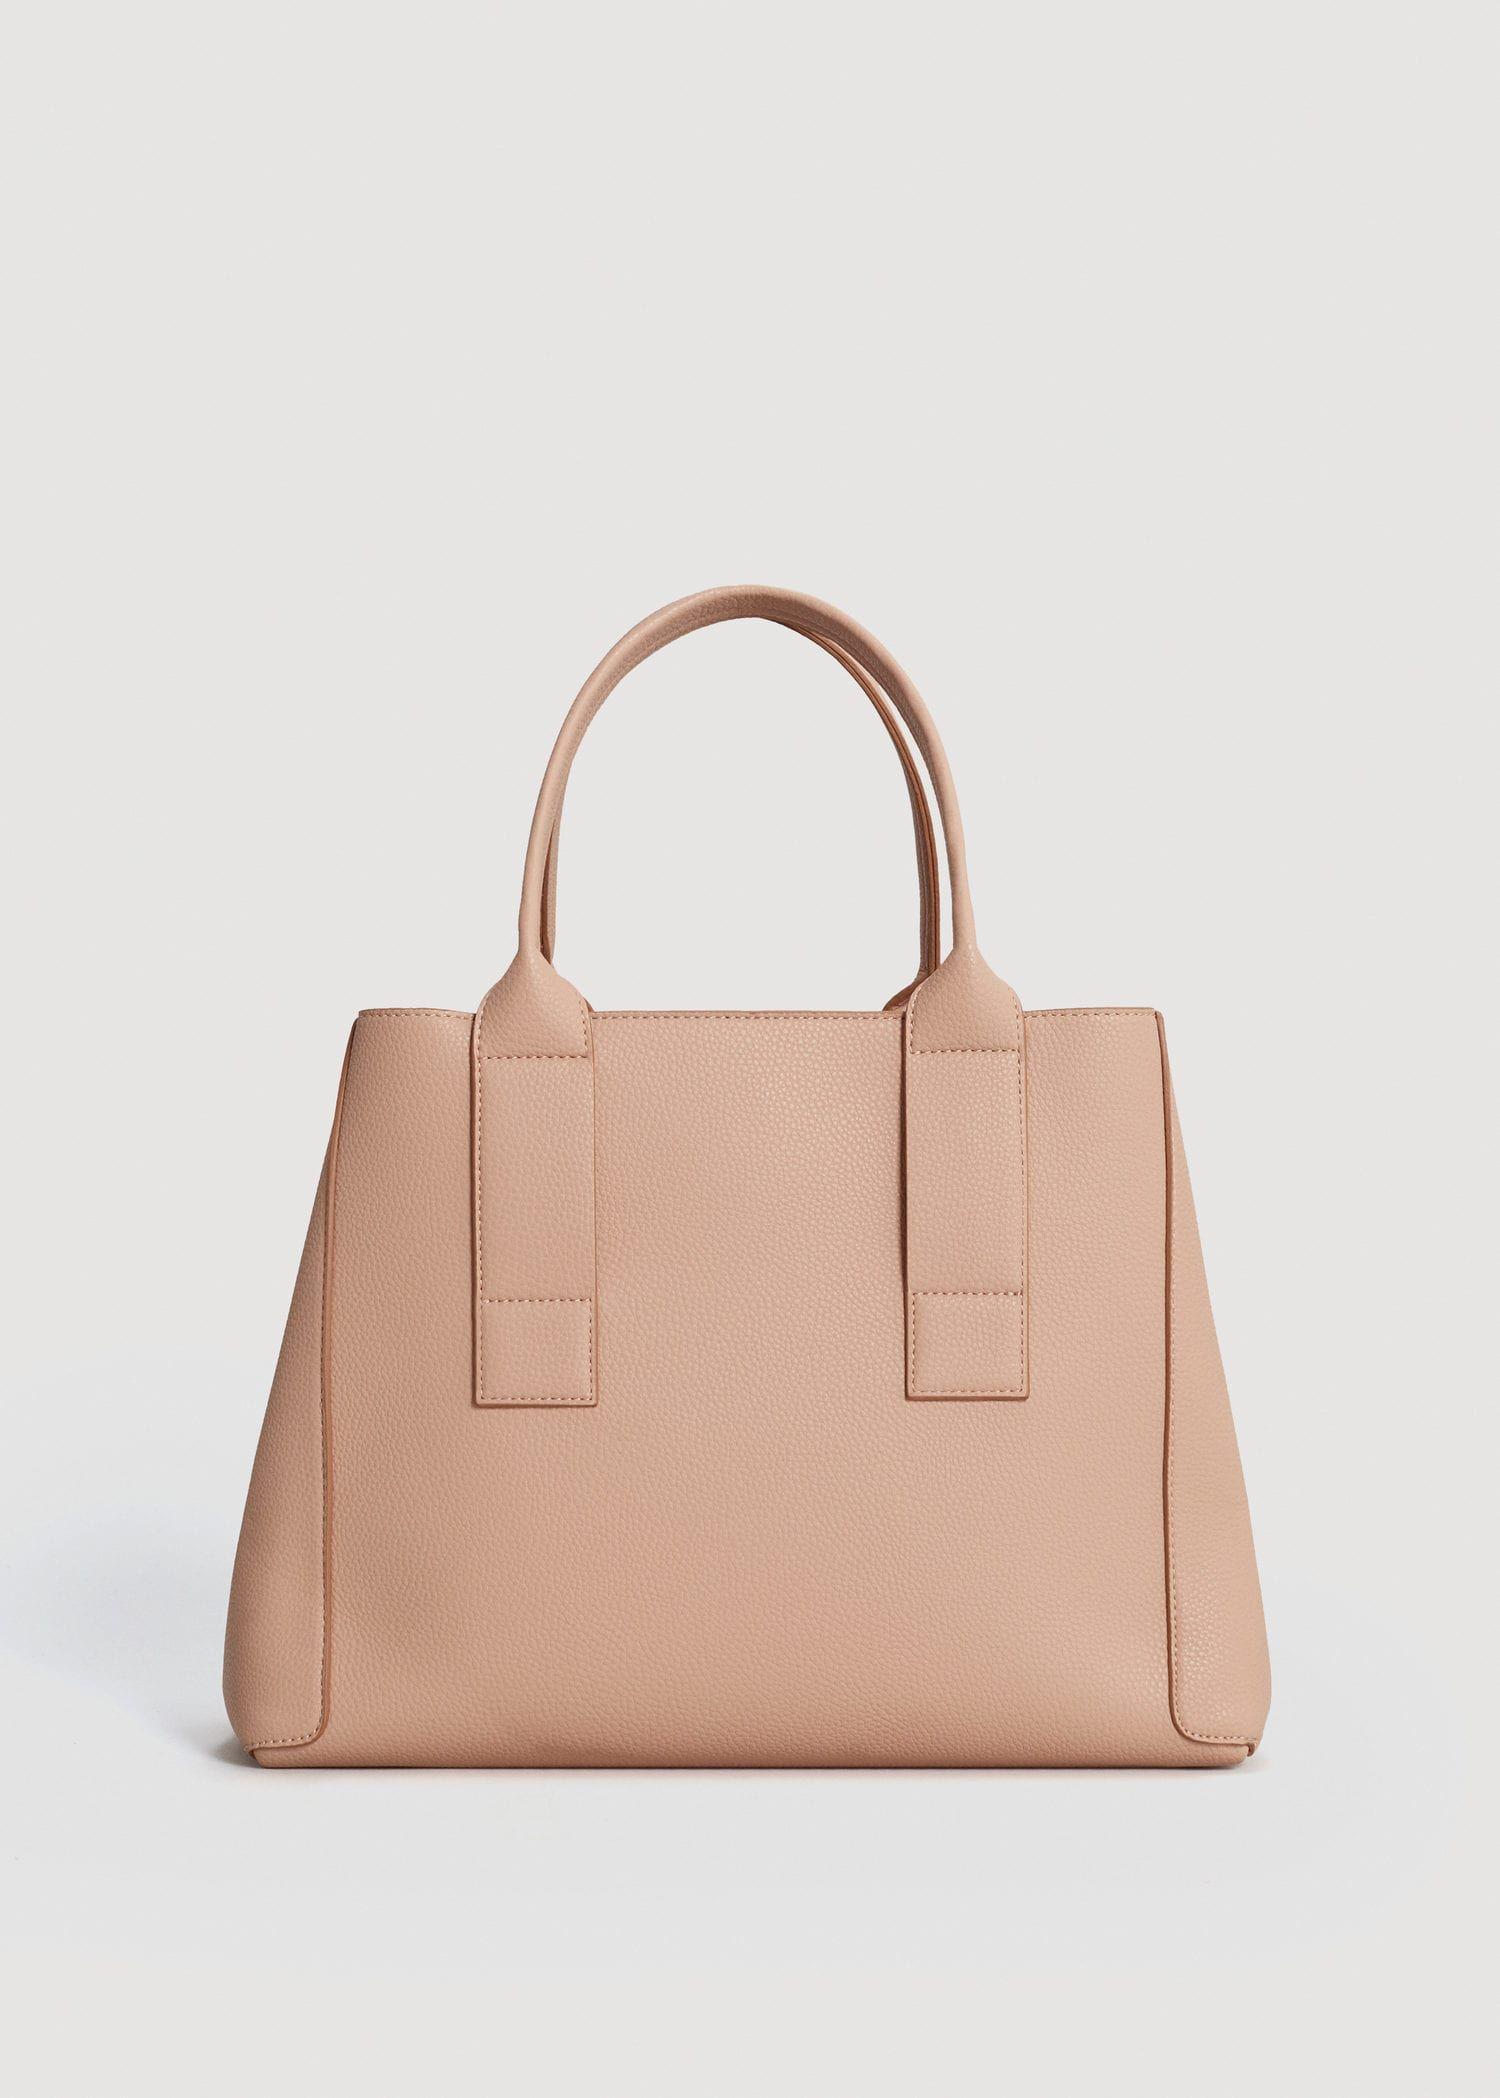 c67d7171c8 Leather cross body bag - Woman